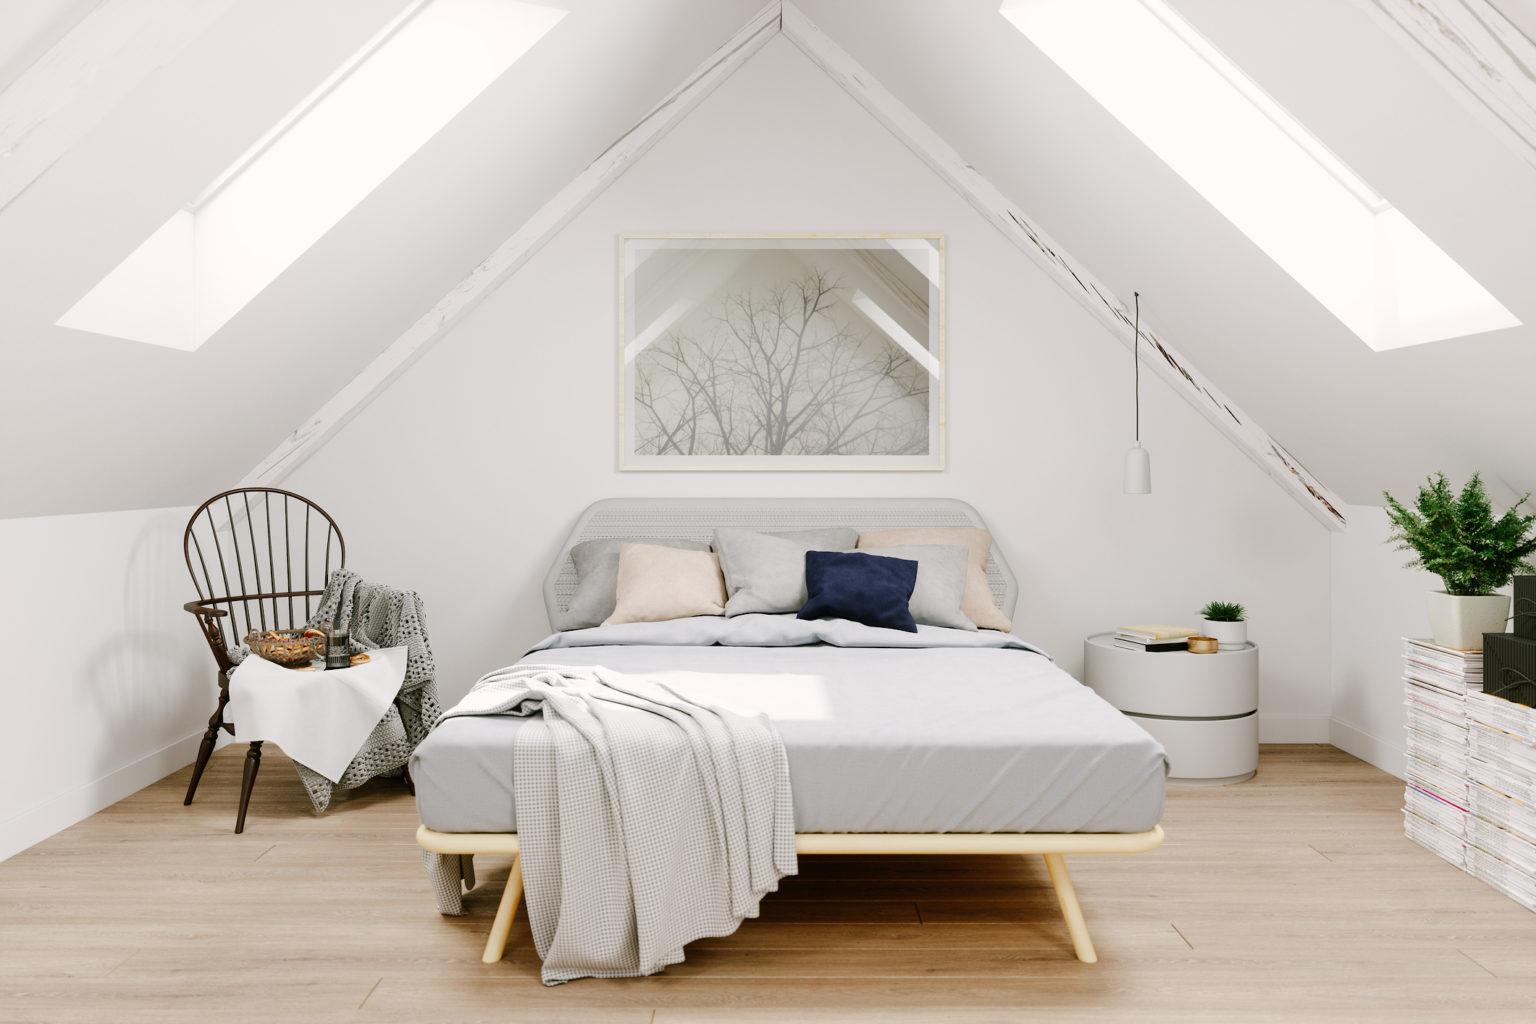 tempat tidur rumah scandinavian